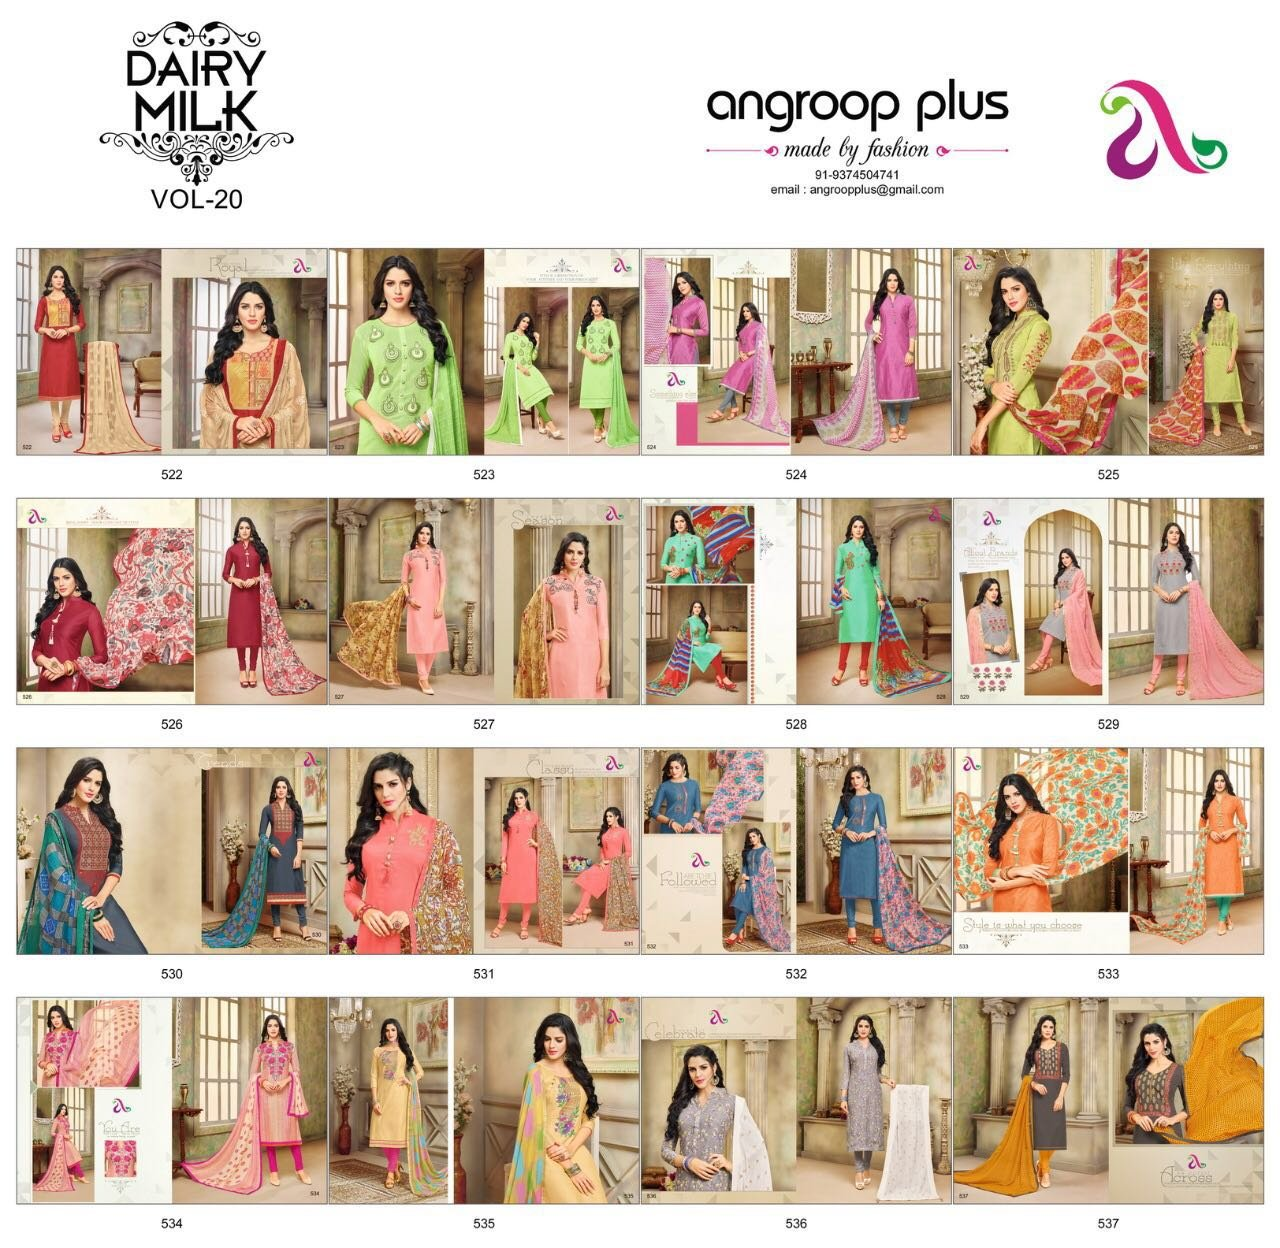 DAIRY Milk VOL-20 16 Pcs Chanderi Cotton Fine Embroidery Salwar Kameez by PANCHAL Creation -03